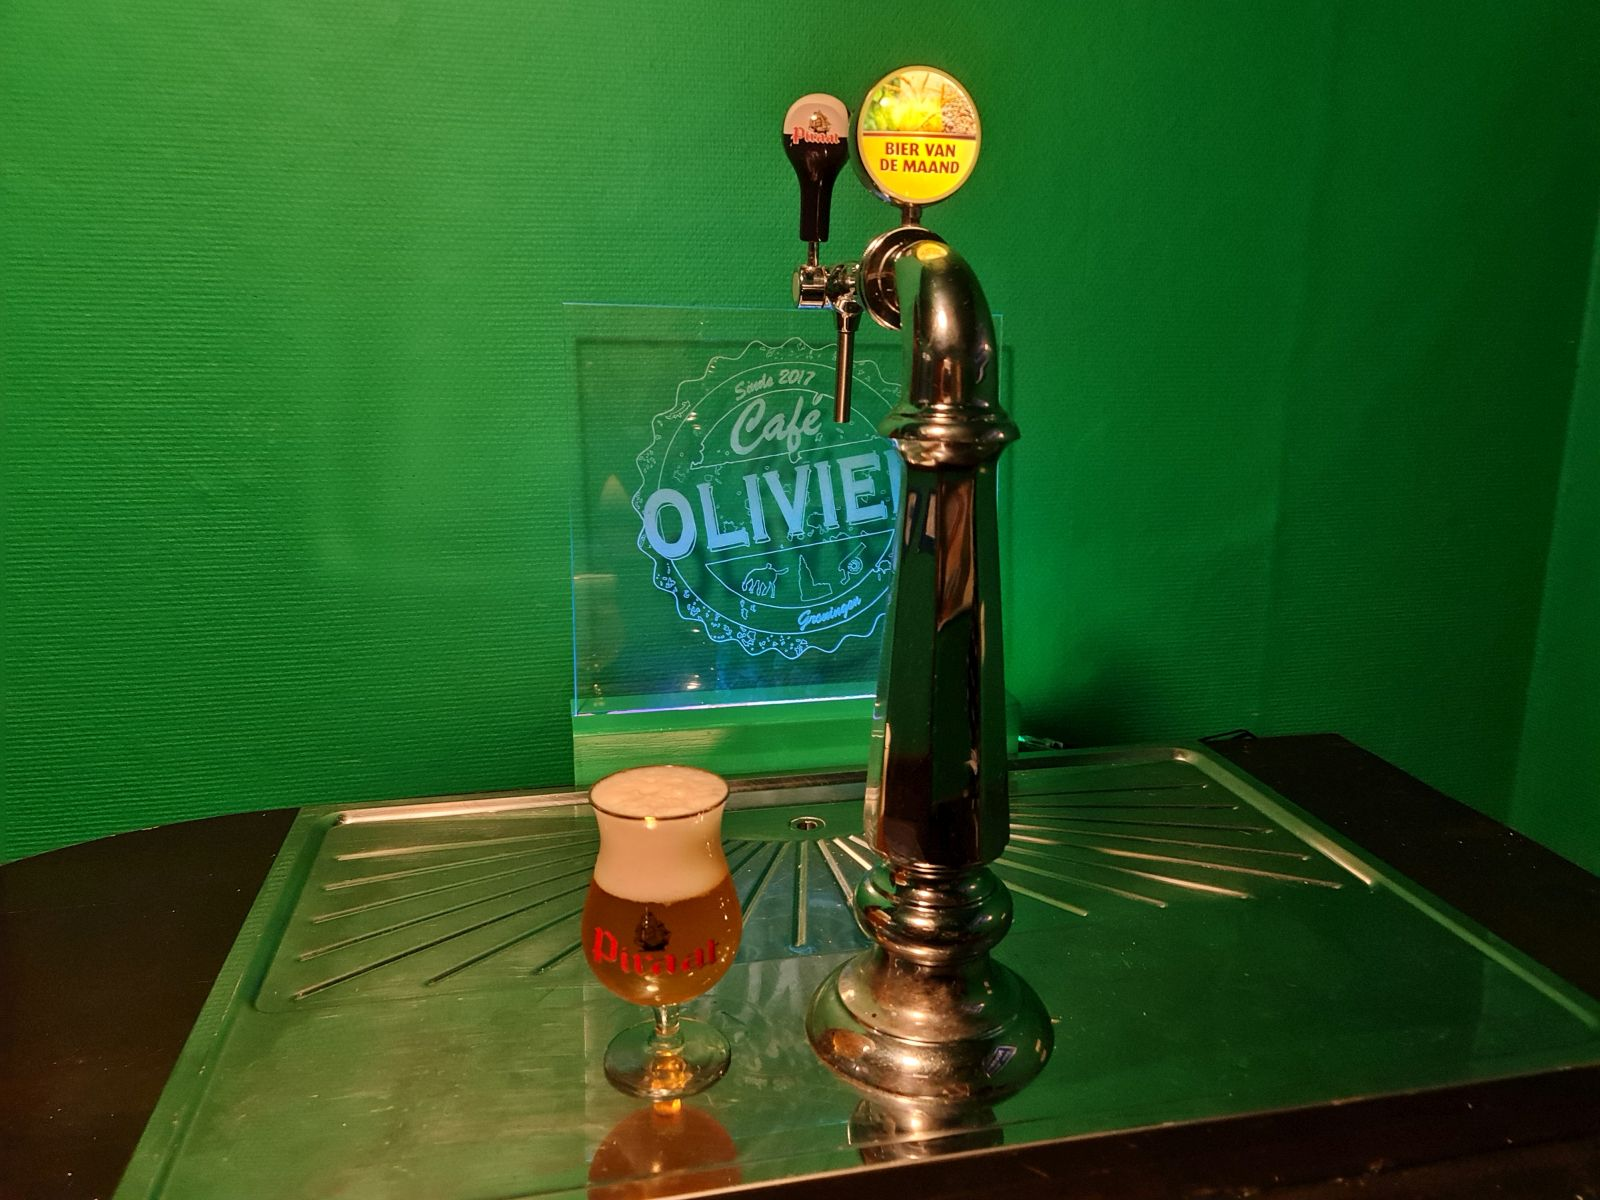 Piraat - Café Olivier